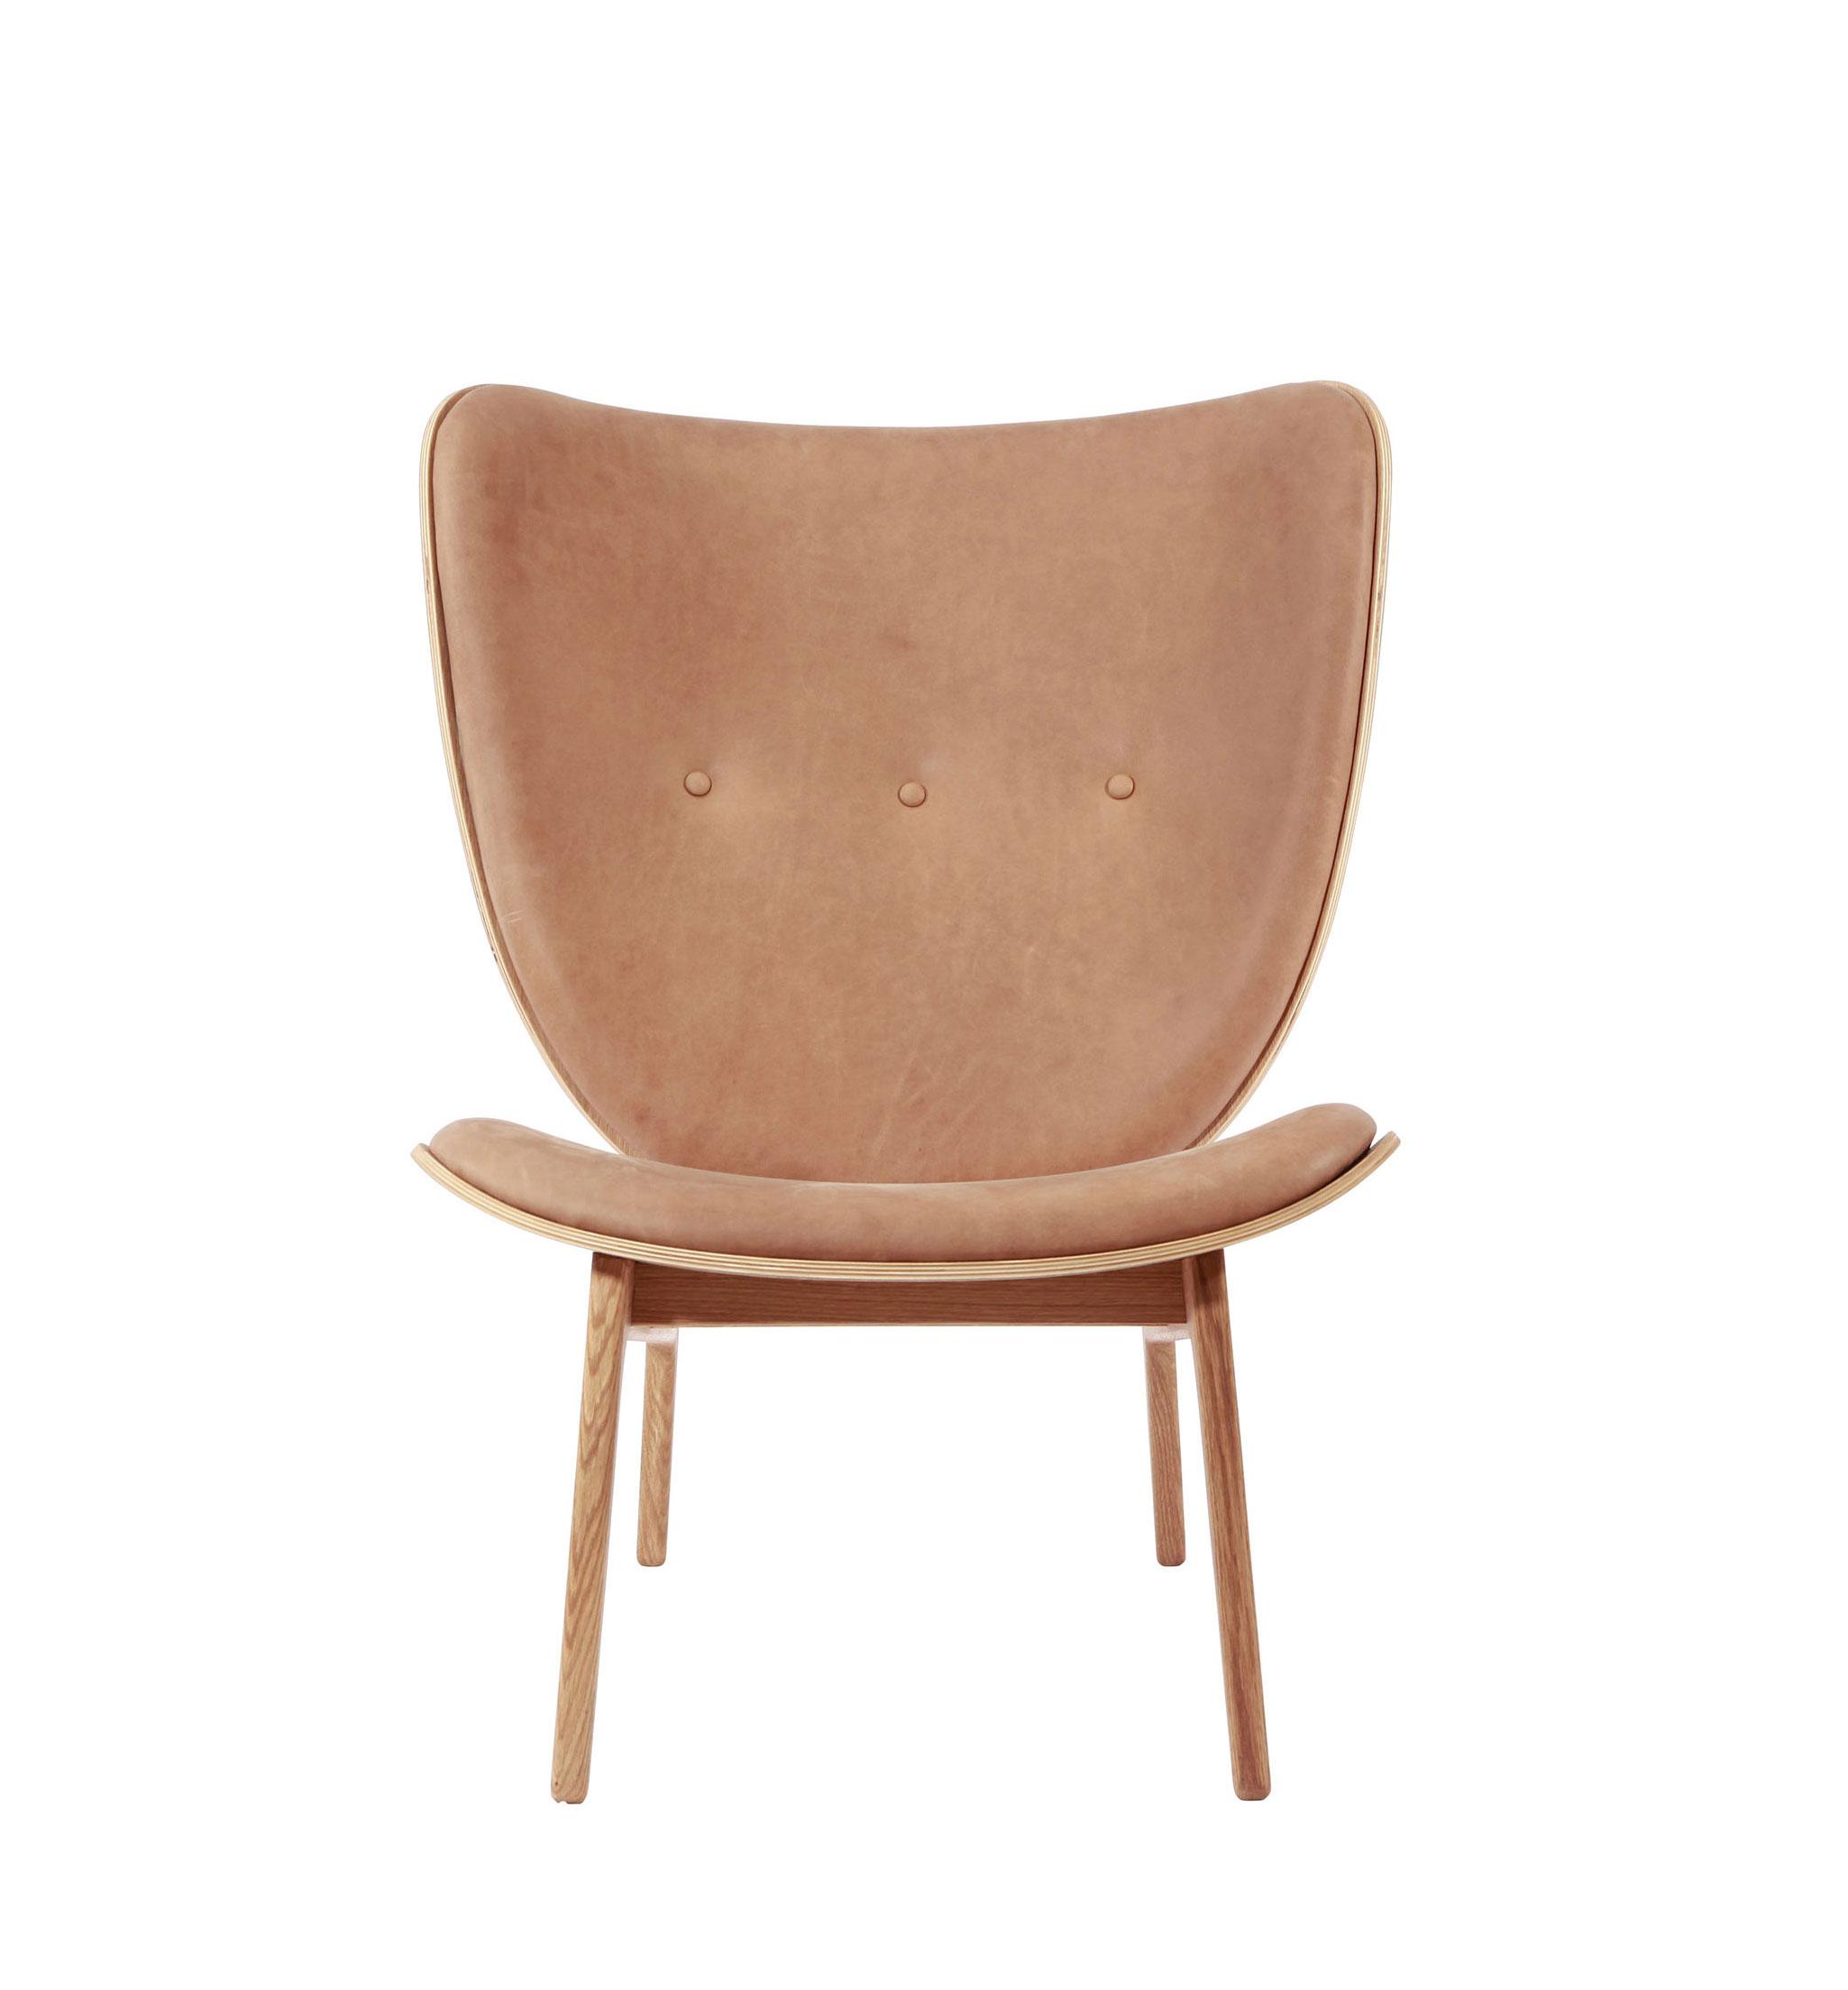 Cool Modern Furniture Lighting Spencer Interiors Vancouver Beatyapartments Chair Design Images Beatyapartmentscom